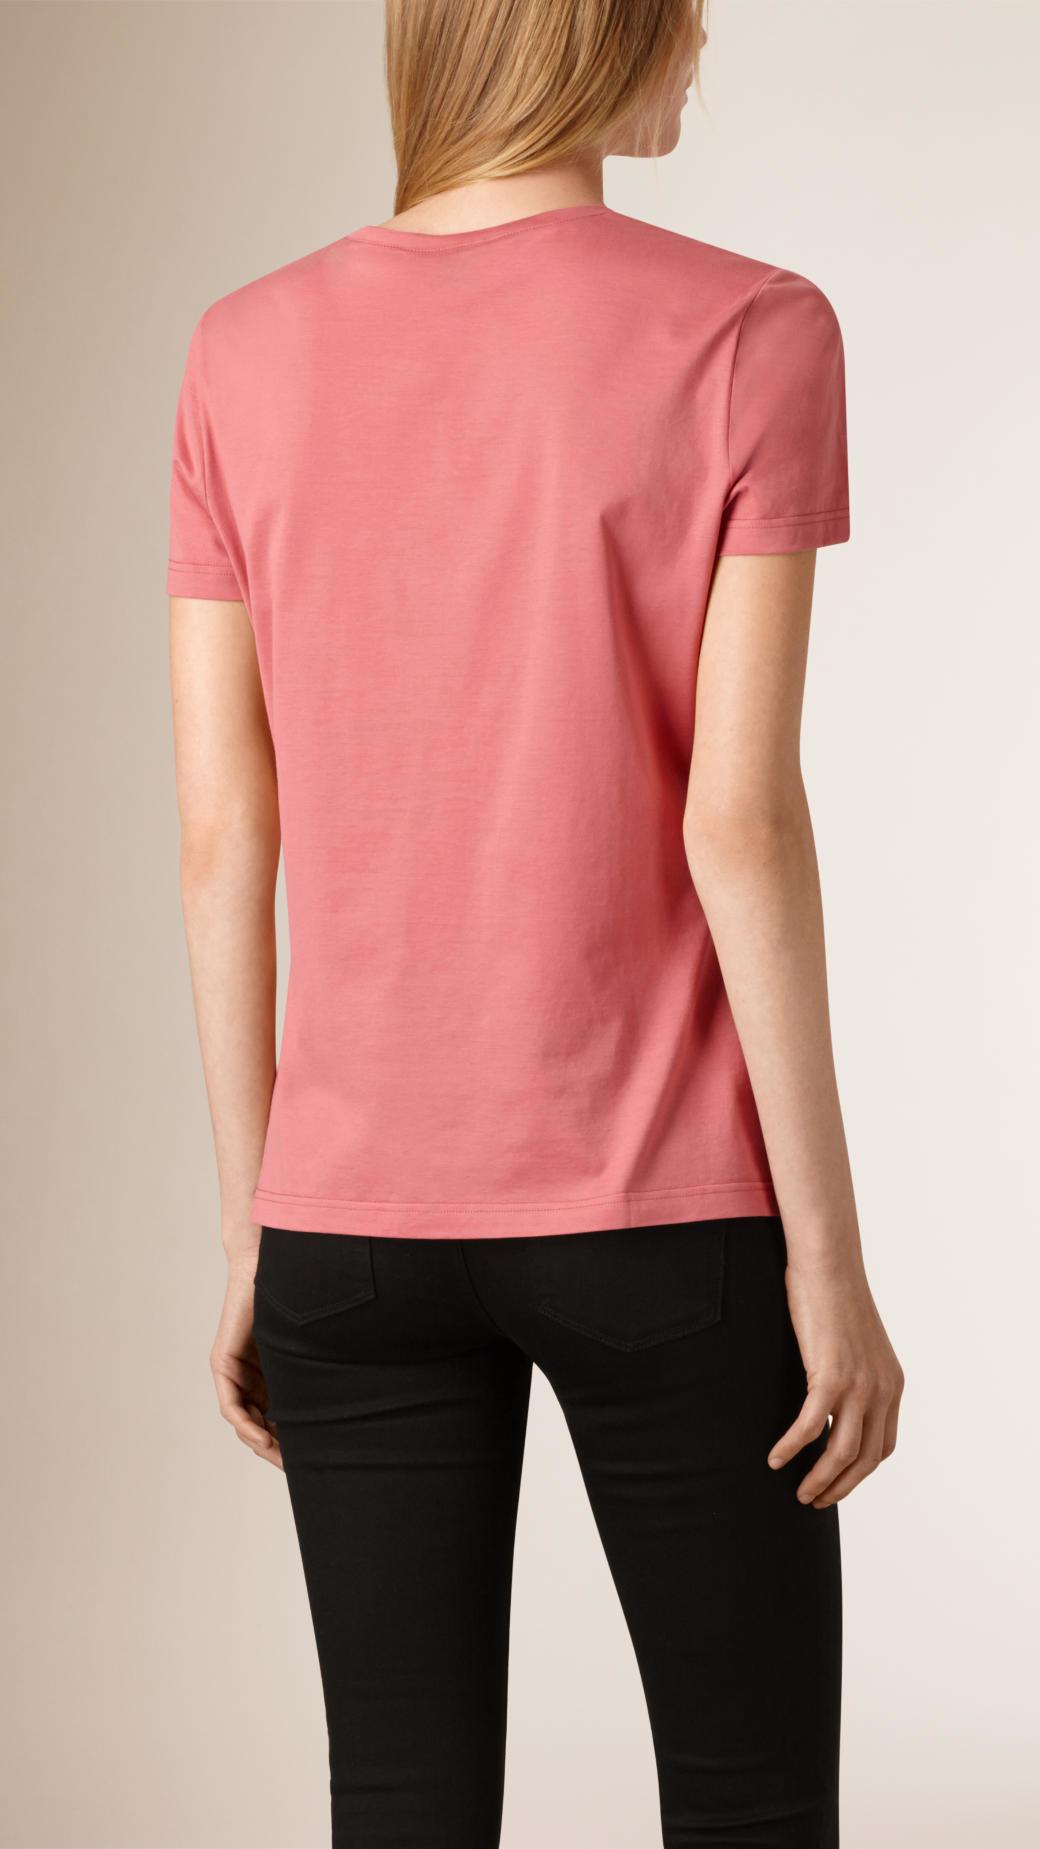 lyst burberry lace pocket cotton t shirt sugar pink in pink. Black Bedroom Furniture Sets. Home Design Ideas